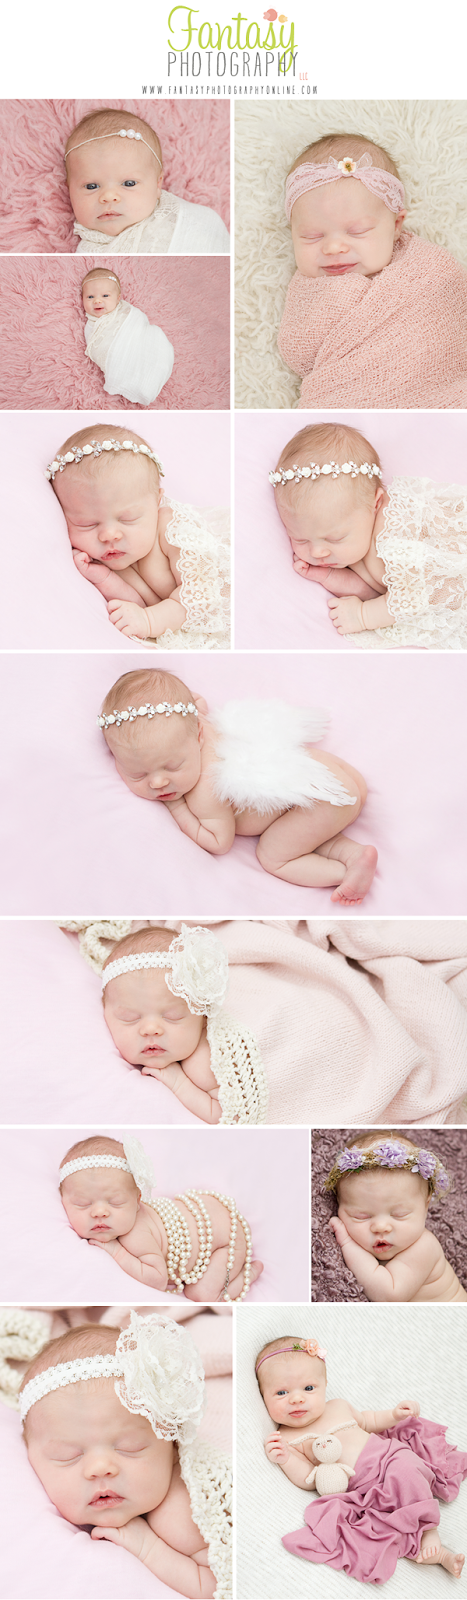 newborn photography in winston salem nc | triad newborn photographers